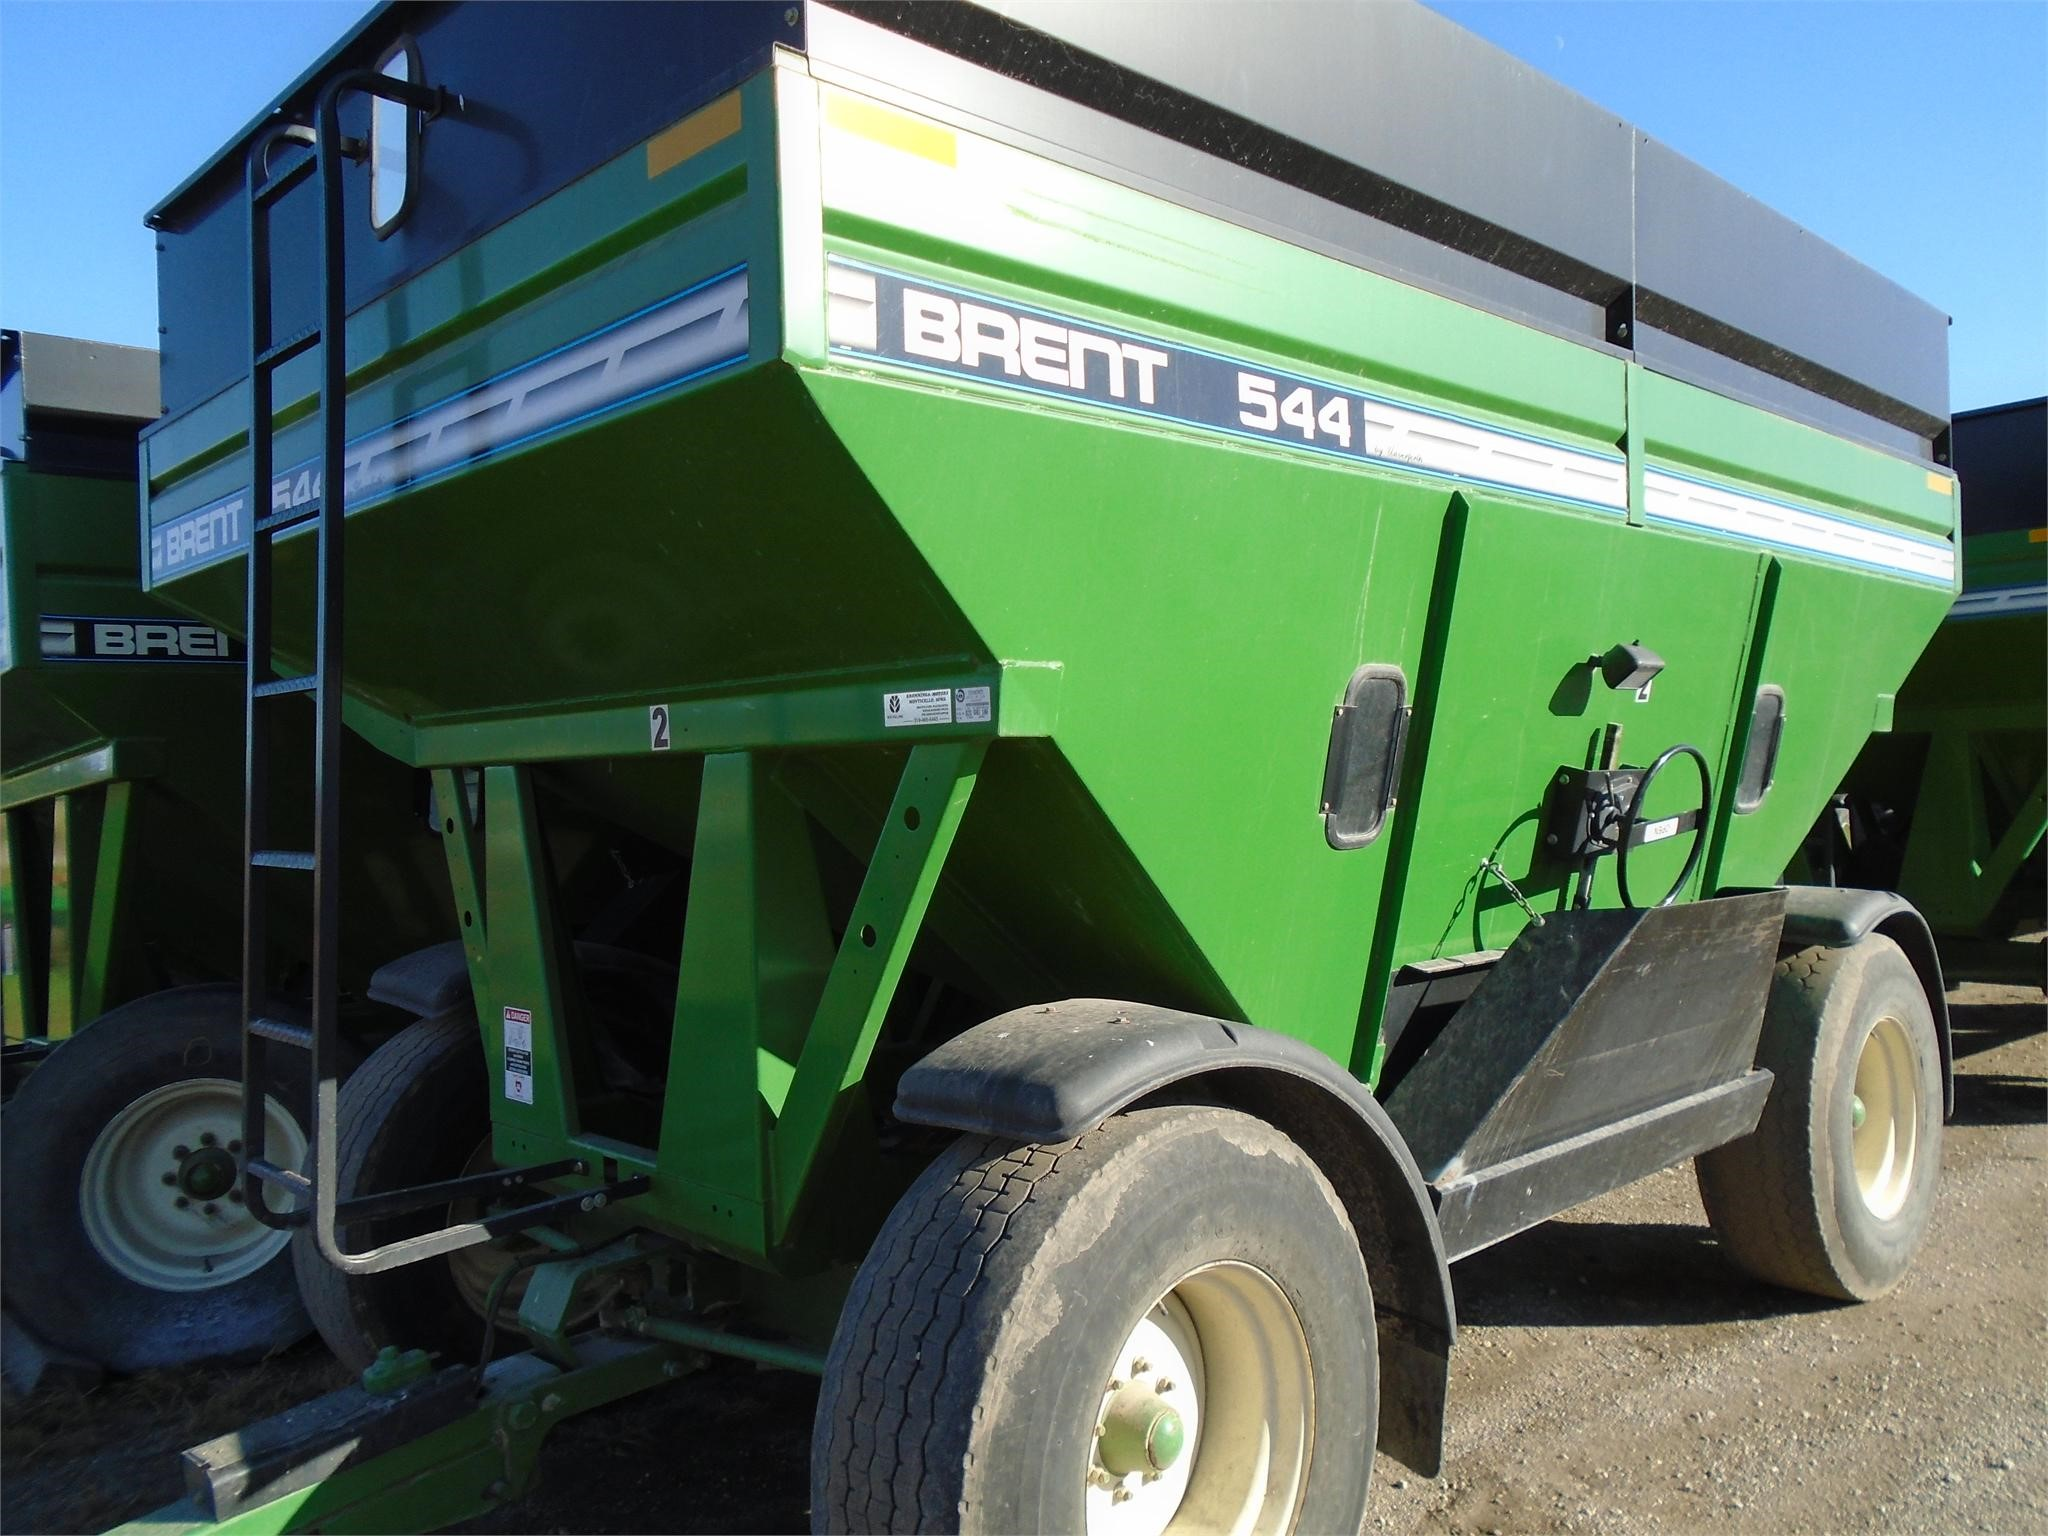 2004 Brent 544 Gravity Wagon